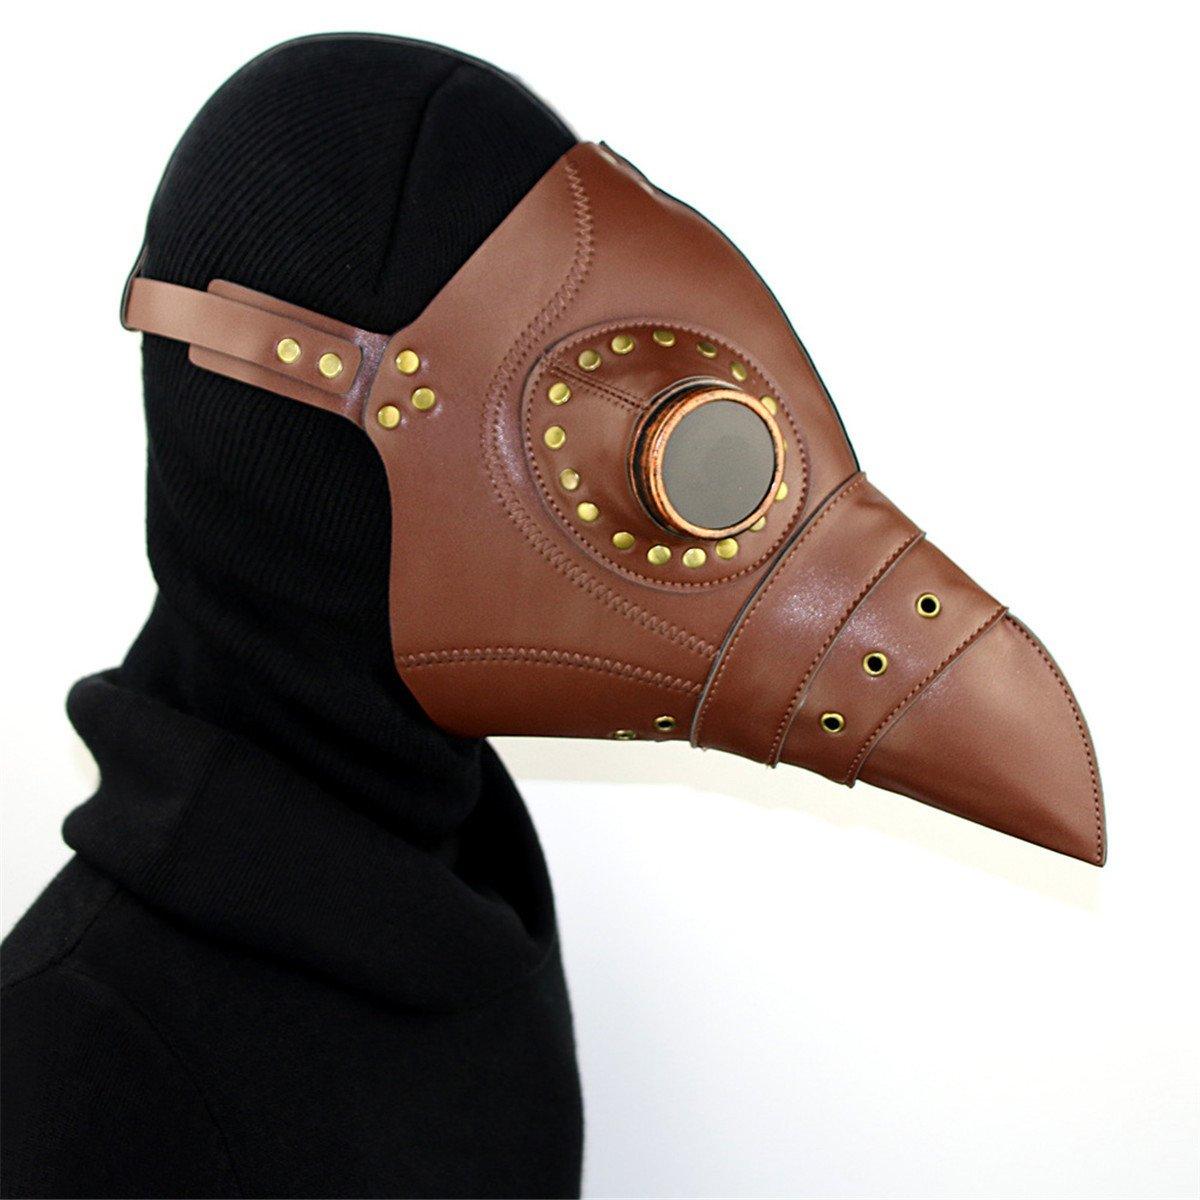 Qhome Steampunk Plague Beak Mask Gothic Cosplay Retro Doctor Bird Mask Brown